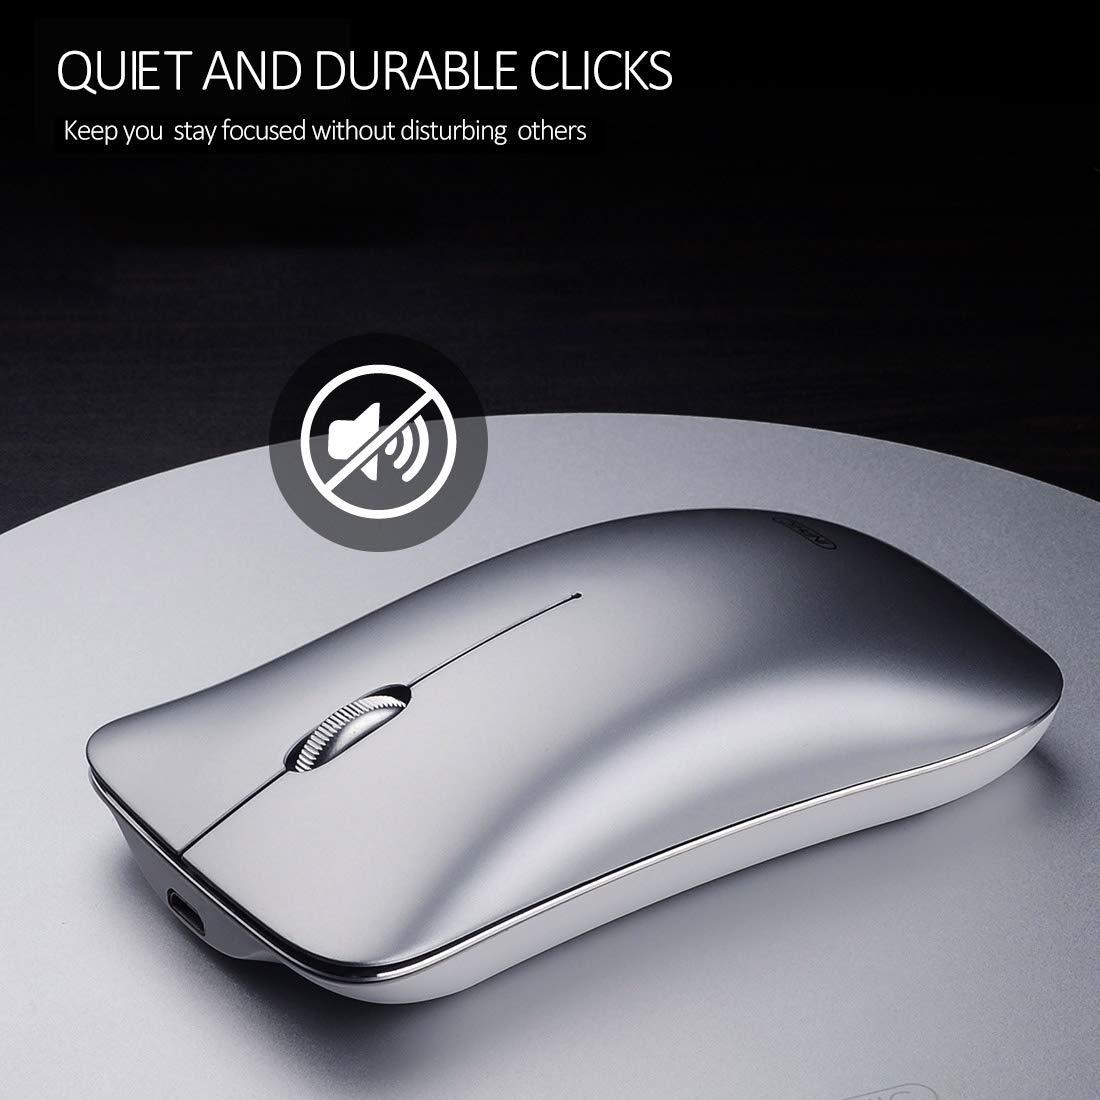 Ratón inalámbrico, Inphic Slim Silent Click Recargable 2.4G Ratones inalámbricos 1600DPI Mini óptico portátil de viaje wireless mouse para PC Ordenador portátil Mac, Espacio Plata